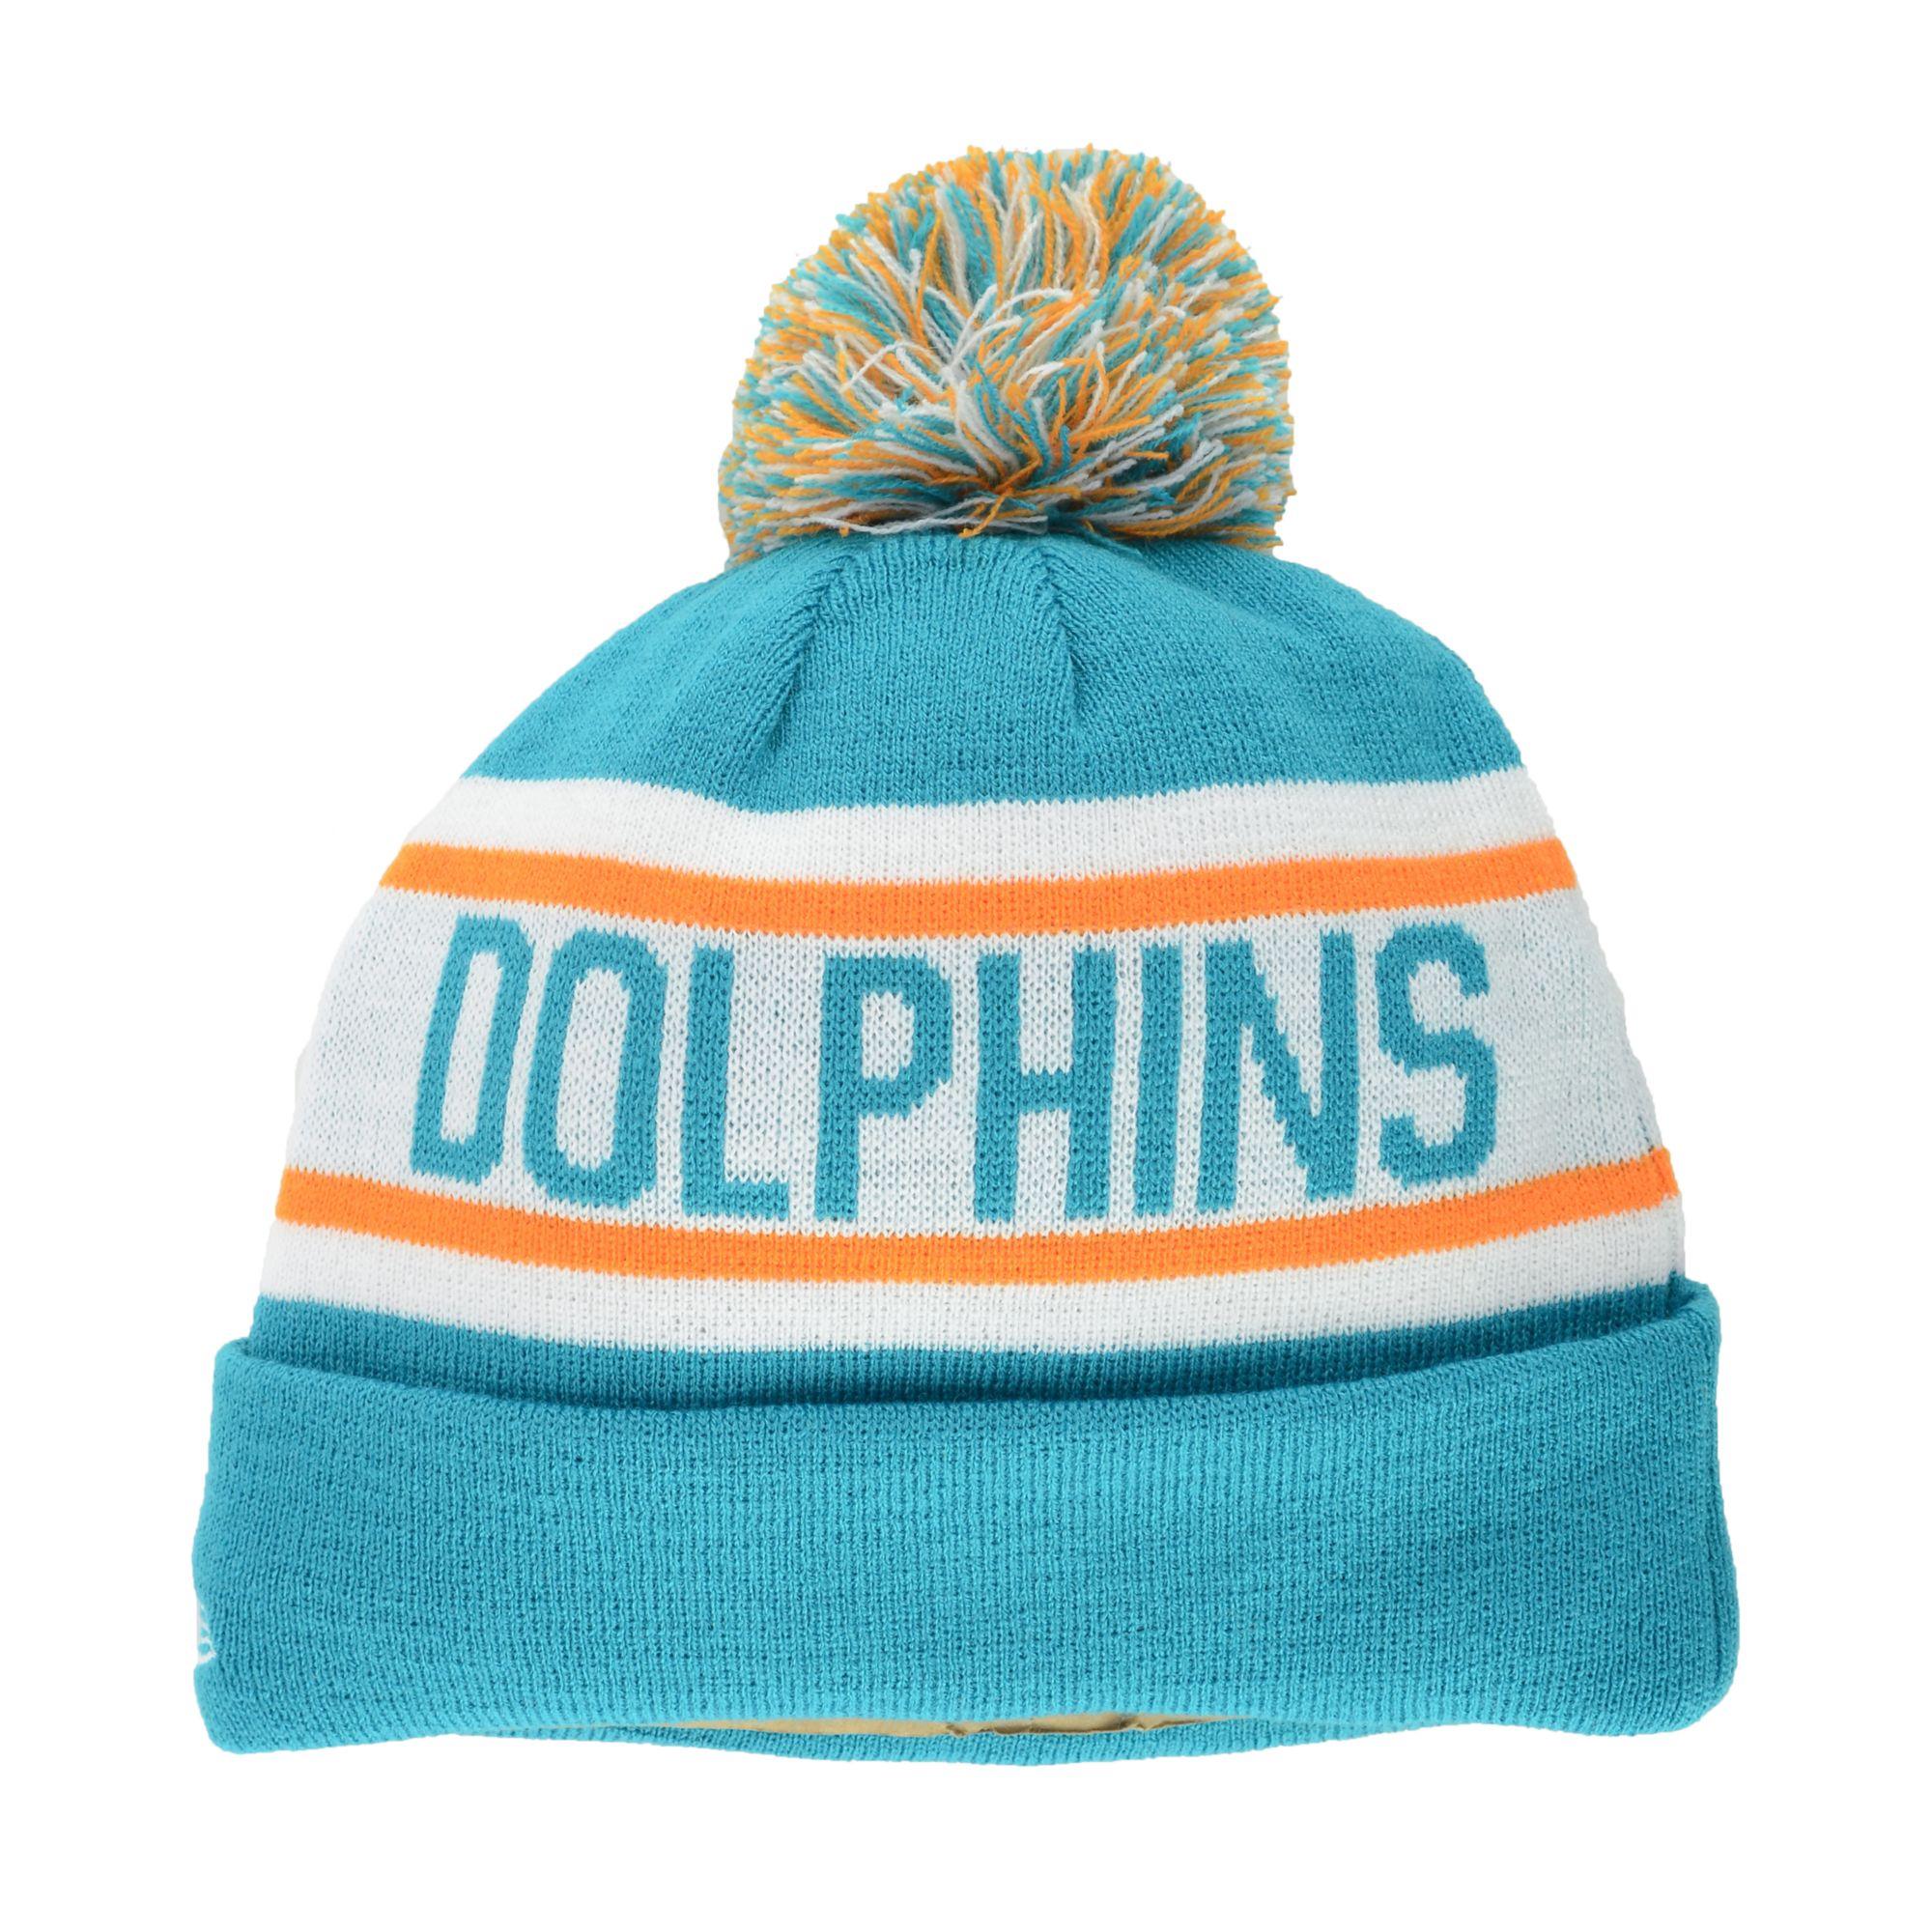 1a586809 Lyst - KTZ Miami Dolphins Biggest Fan Knit Hat in Blue for Men